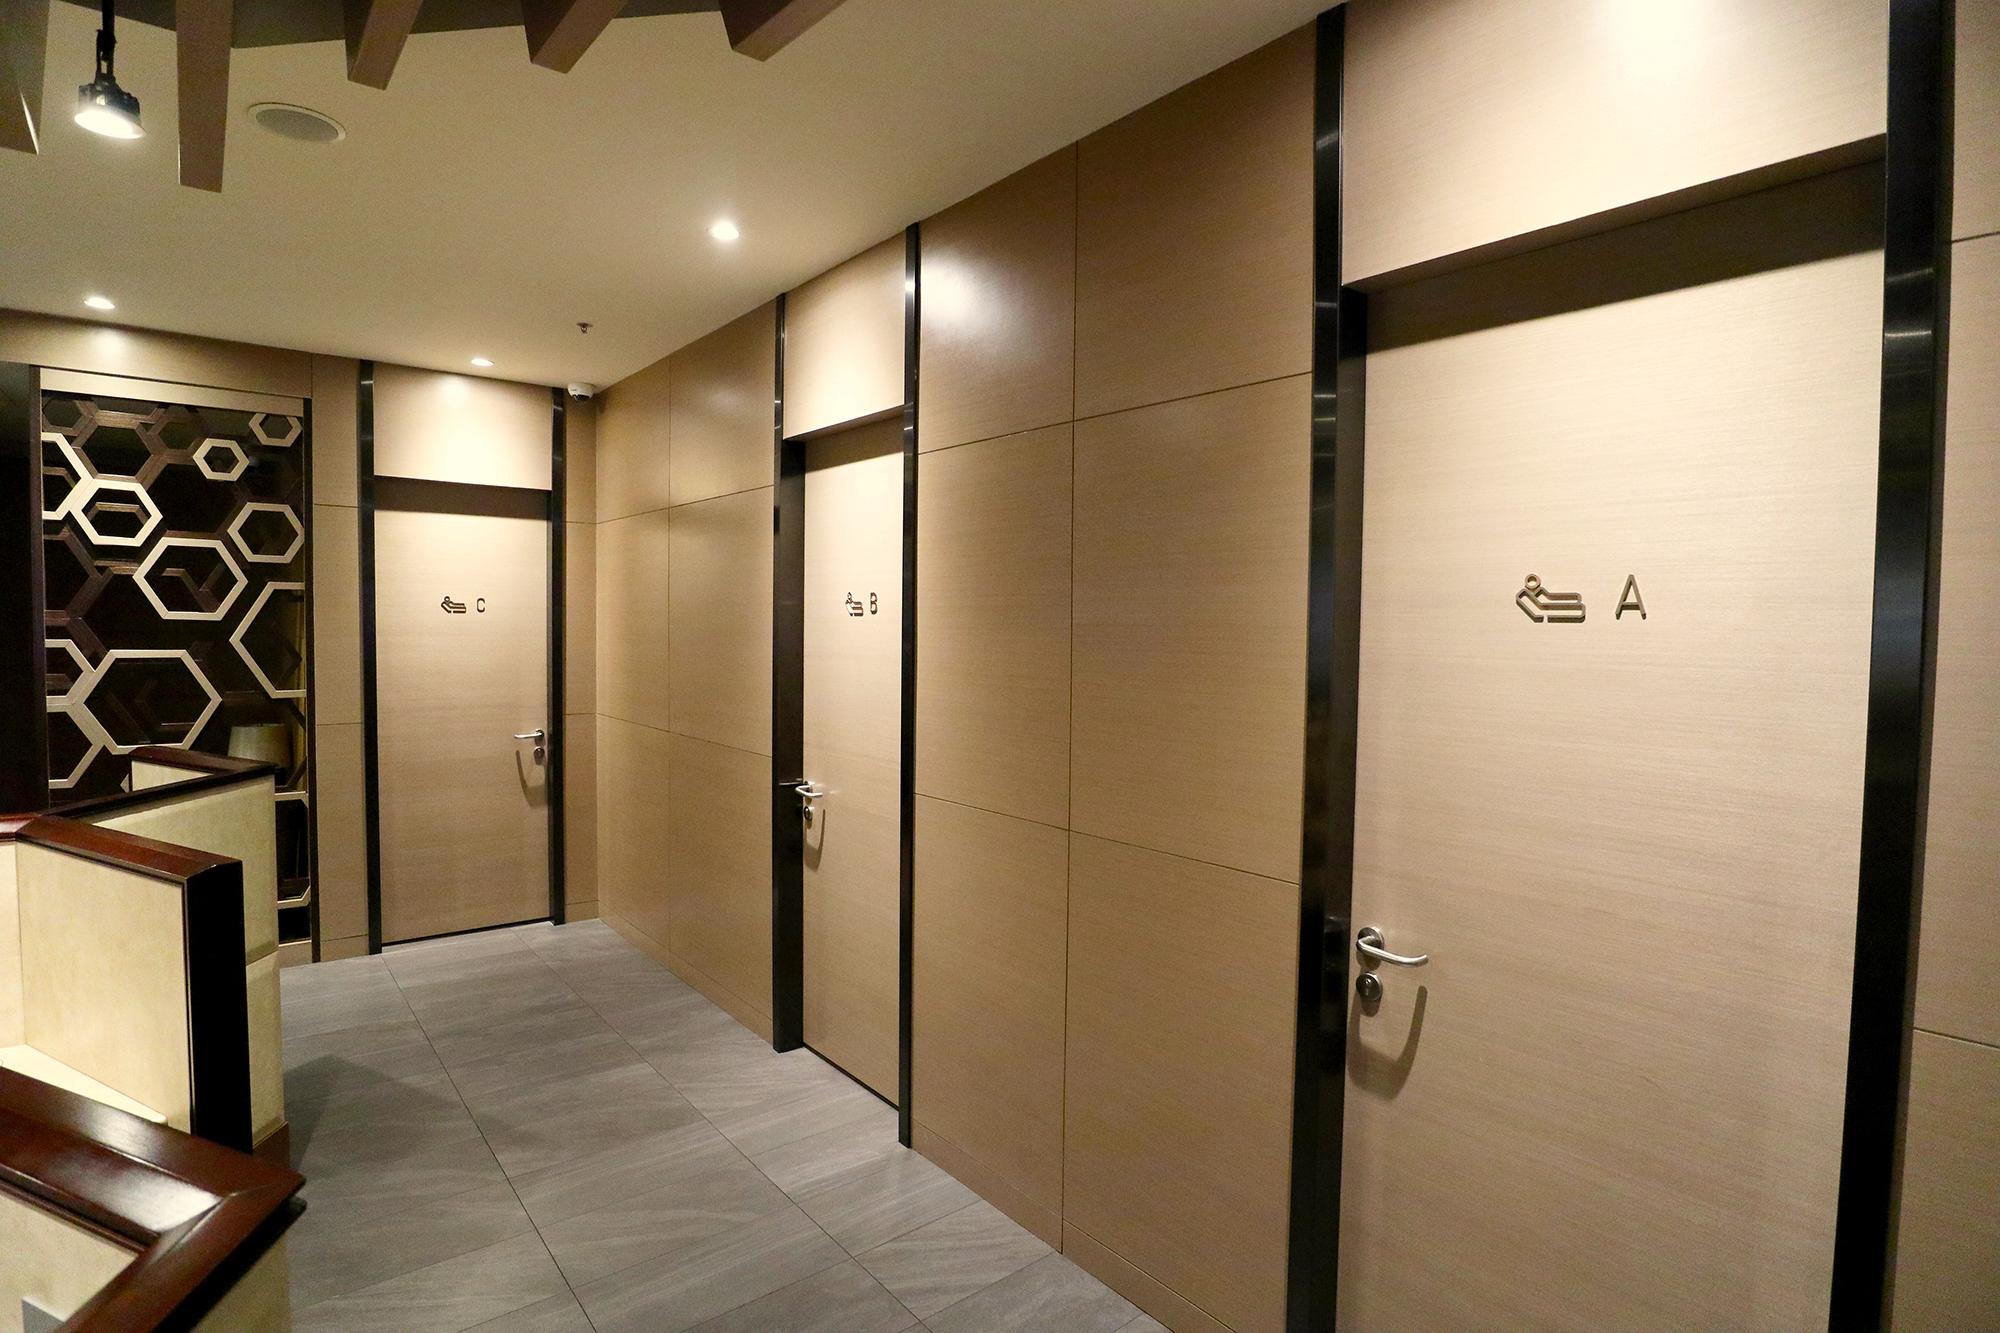 Nap Rooms